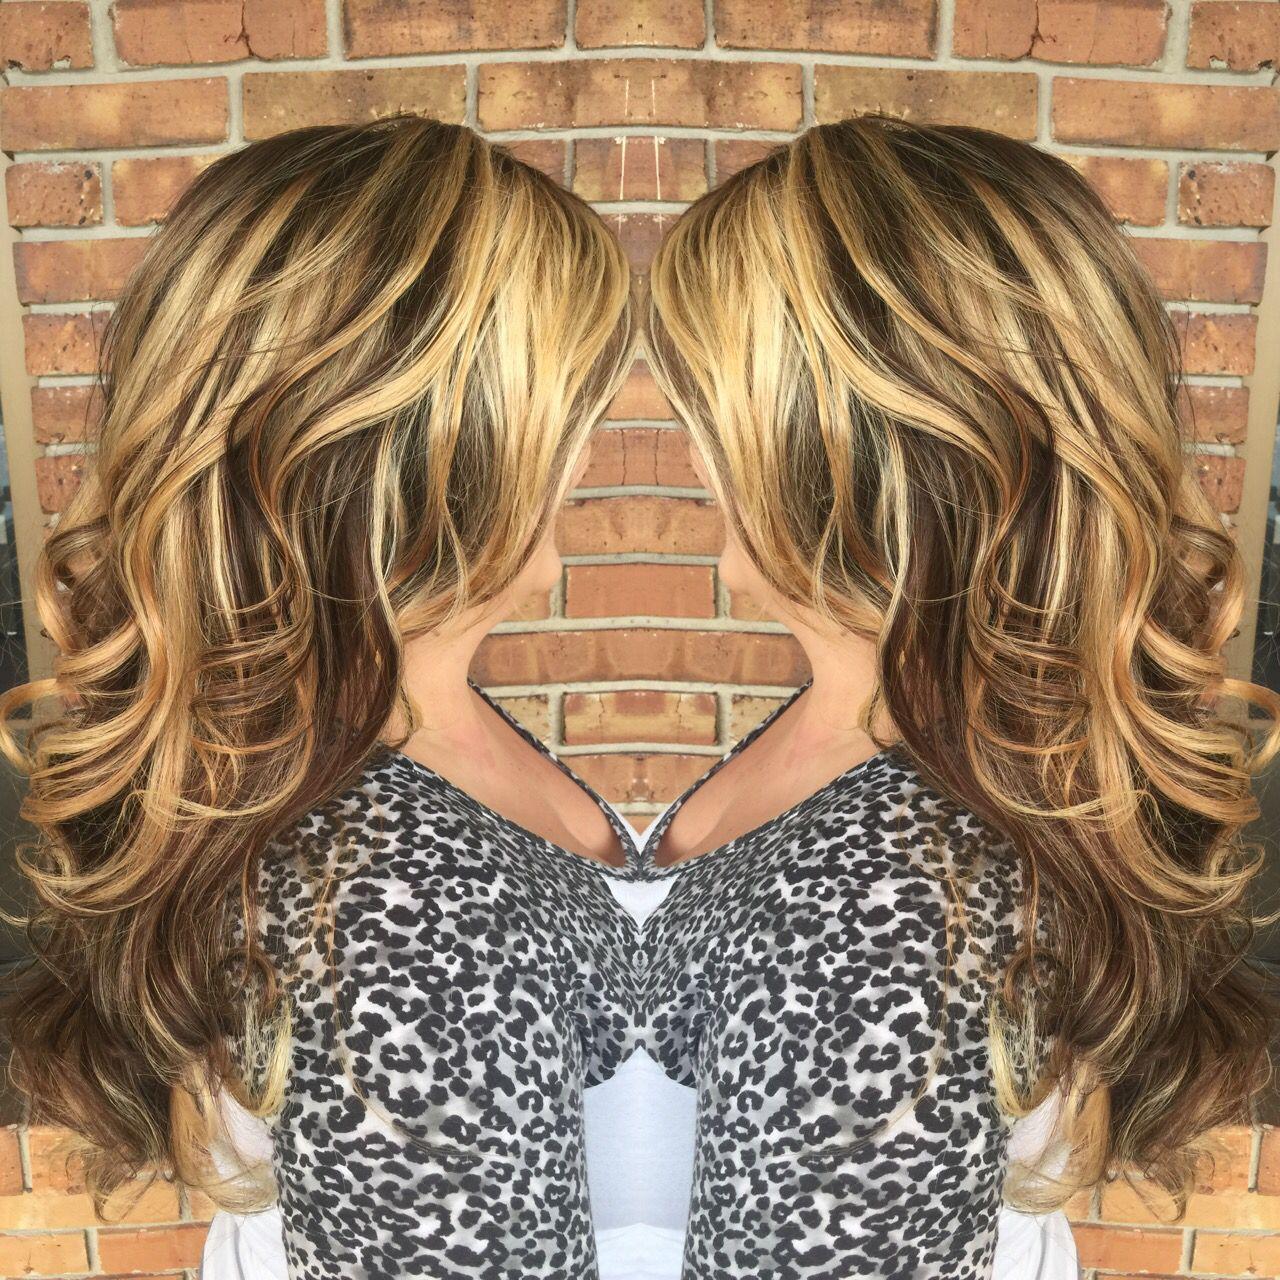 Blonde and brown balayage